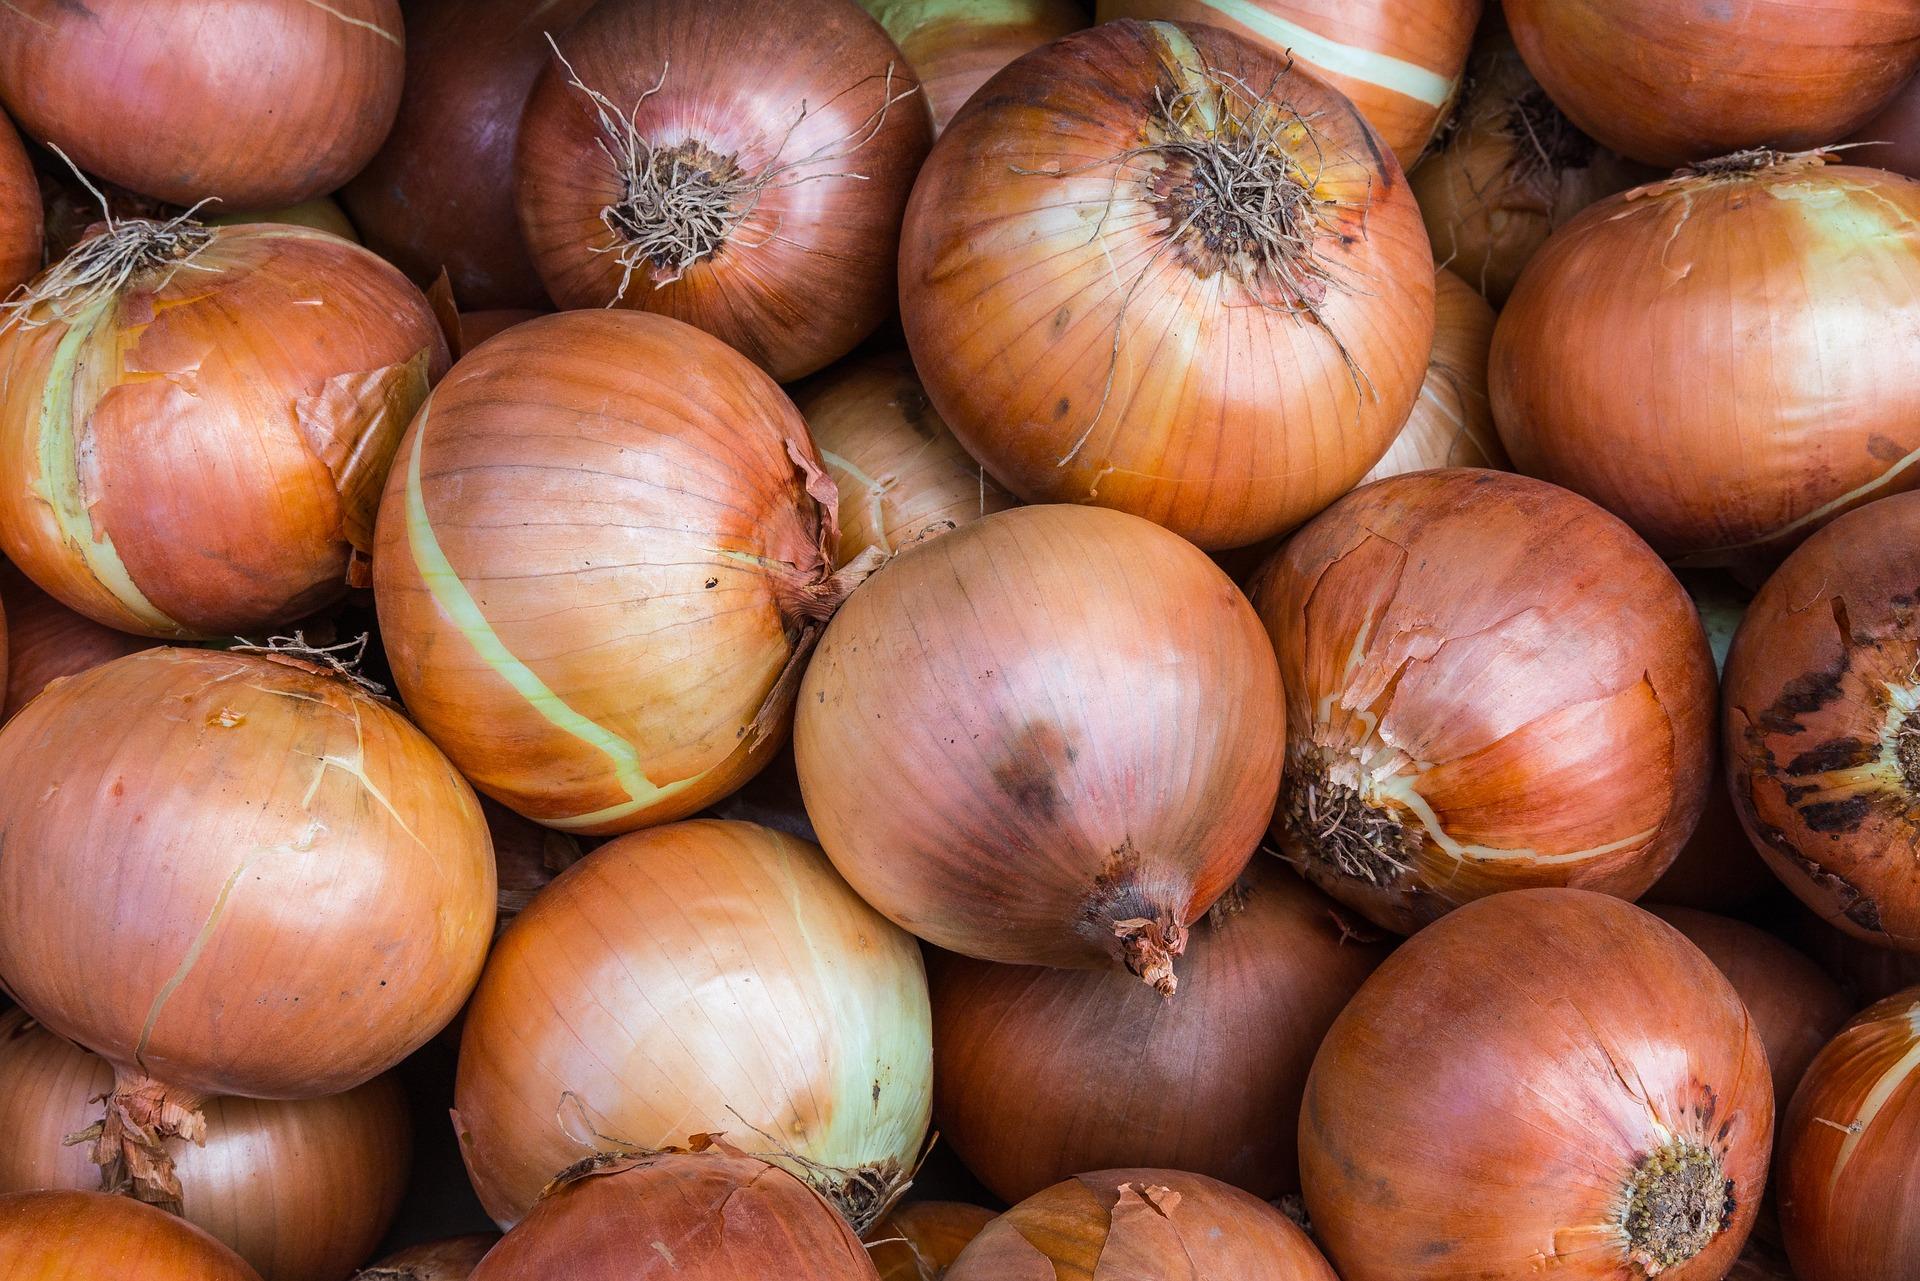 onions-1078149_1920